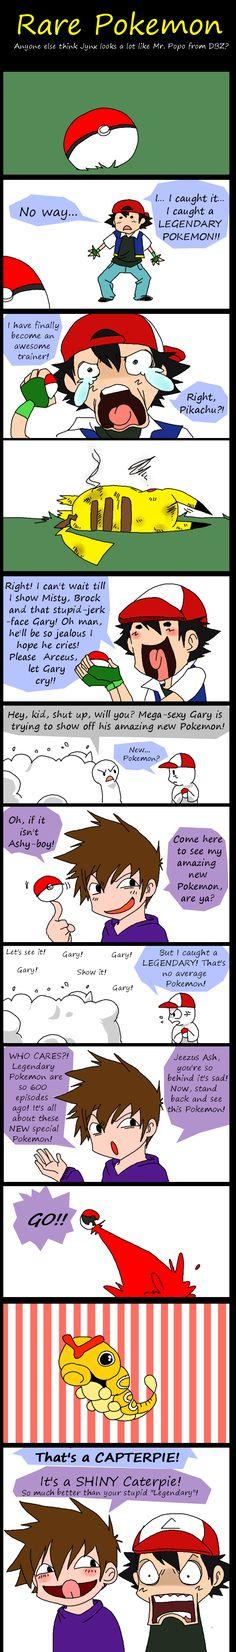 PKMN: Rare Pokemon by =AKUMA-Y0RU